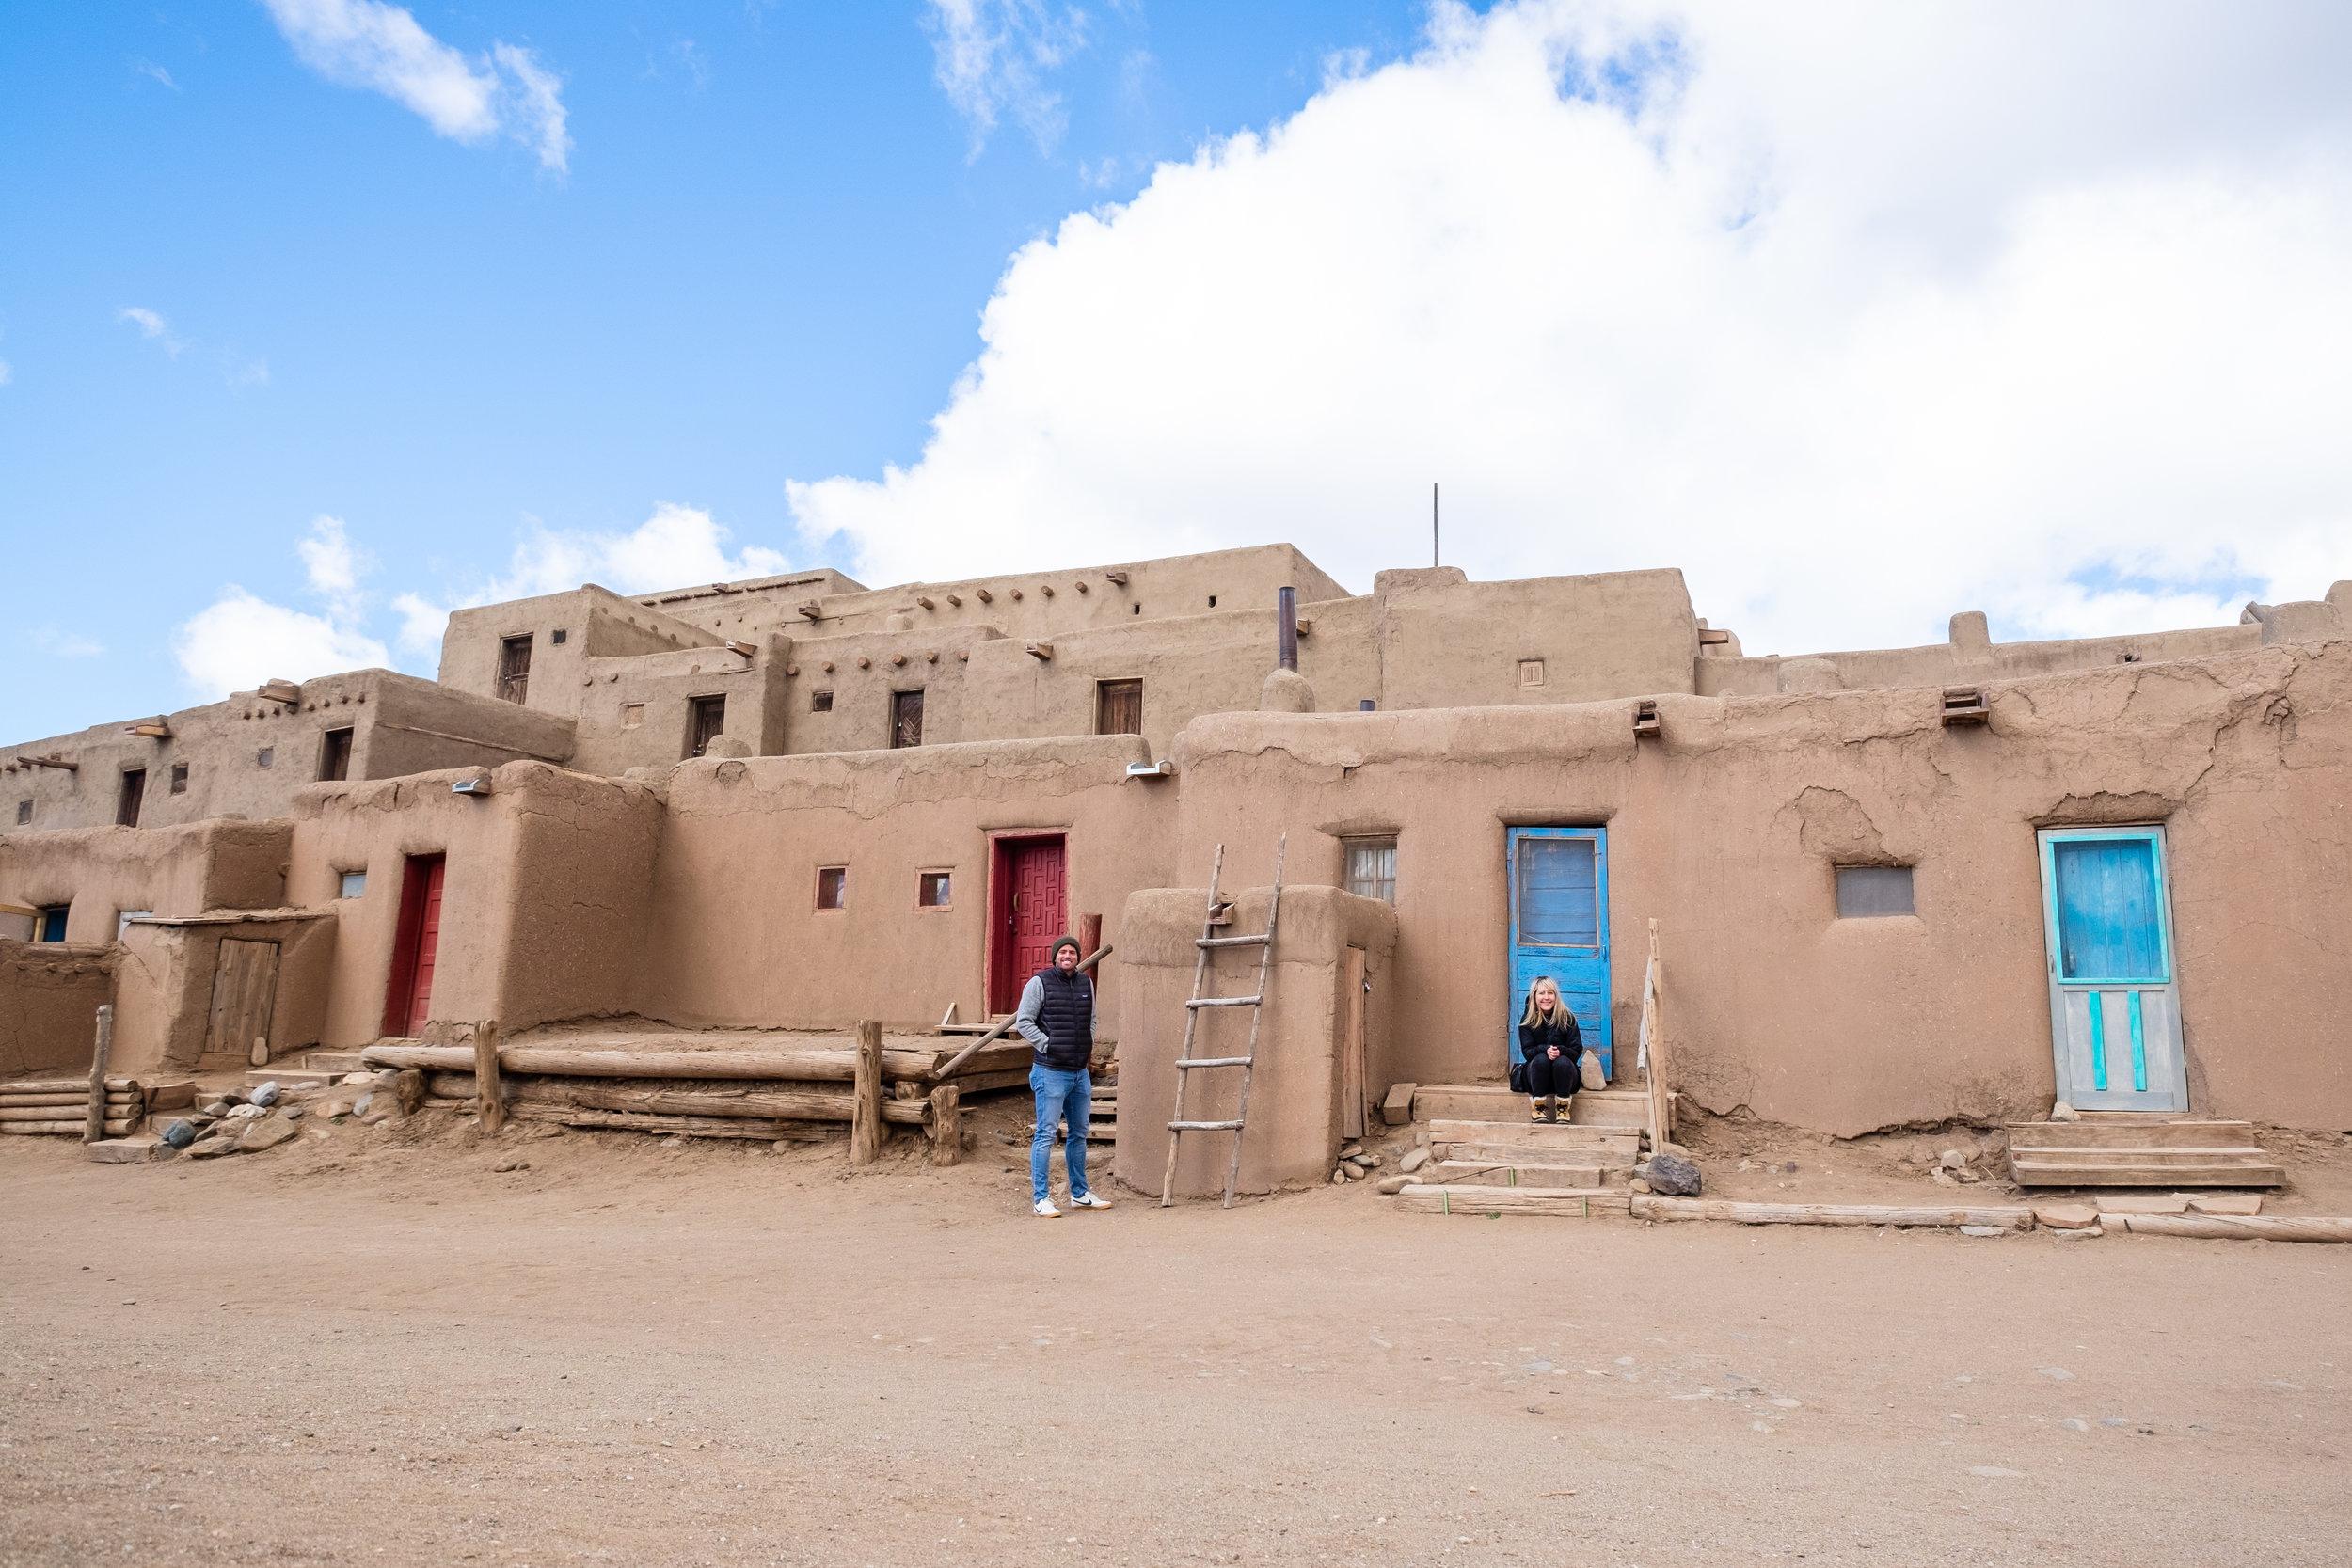 Exploring the historic Taos Pueblo